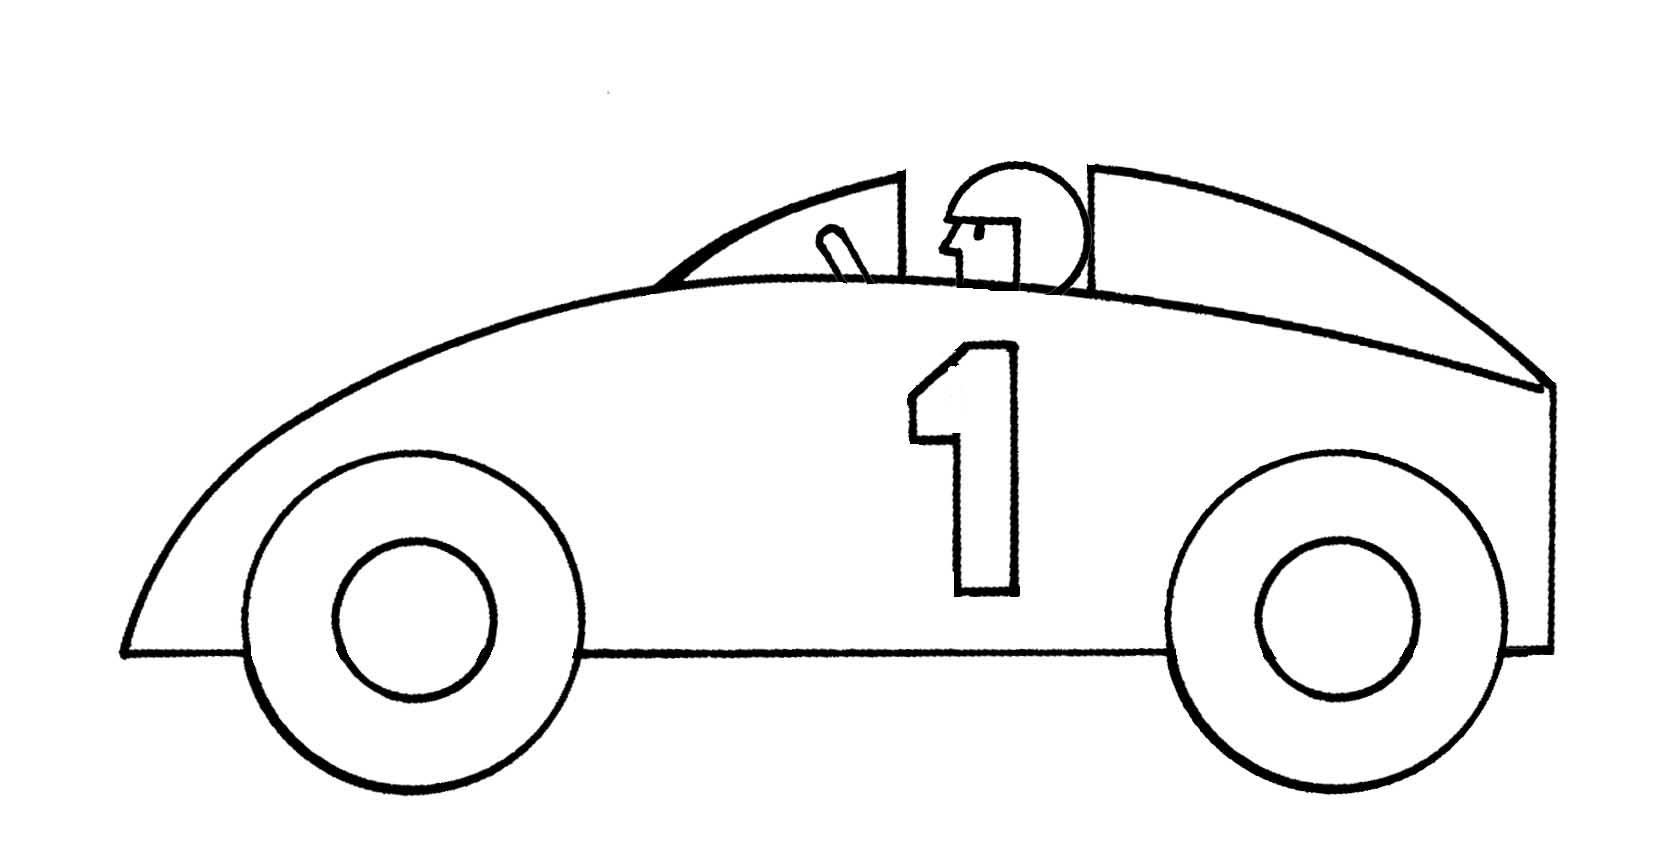 Car clipart outline. Race